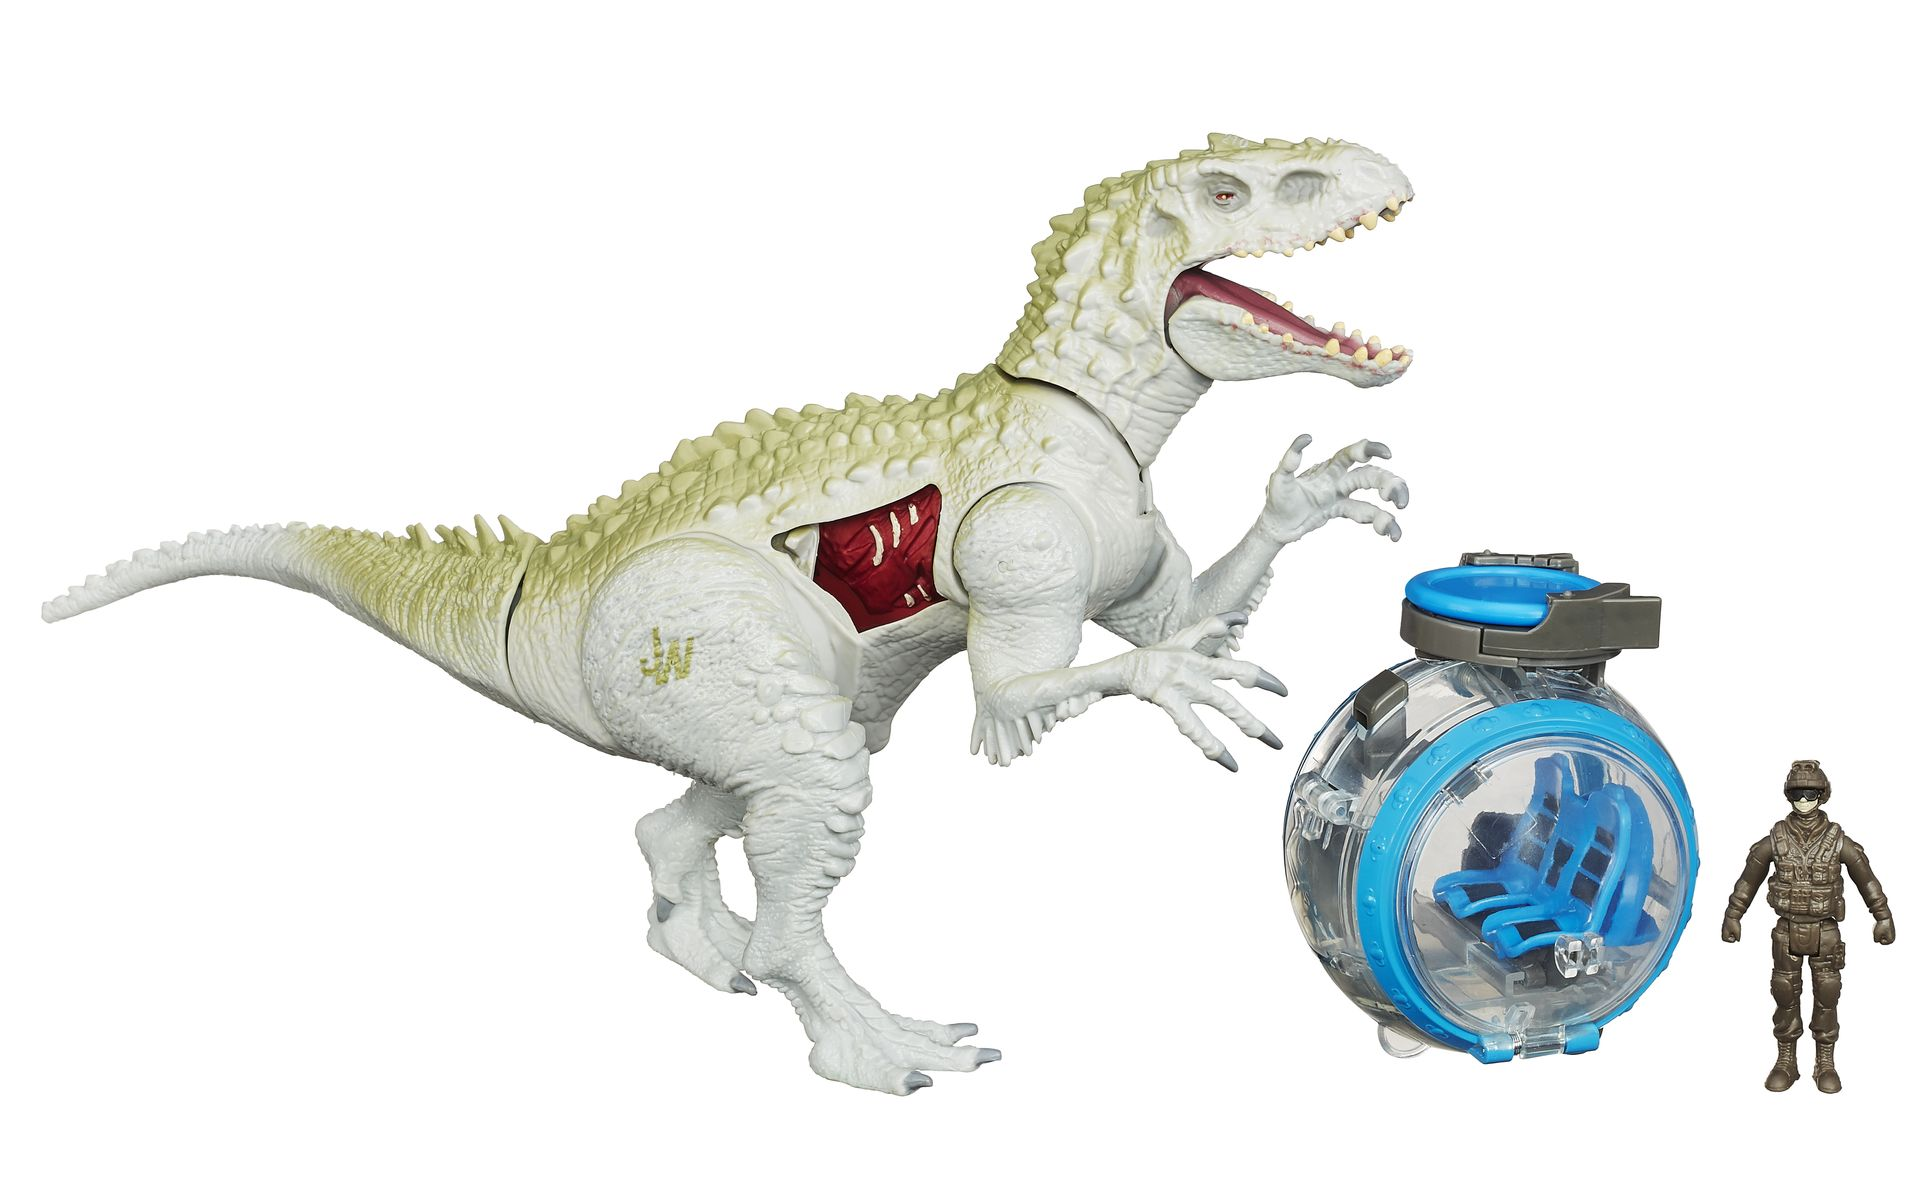 Concours jurassic world gagnez des dinosaures hasbro - Dinosaure jurassic world ...